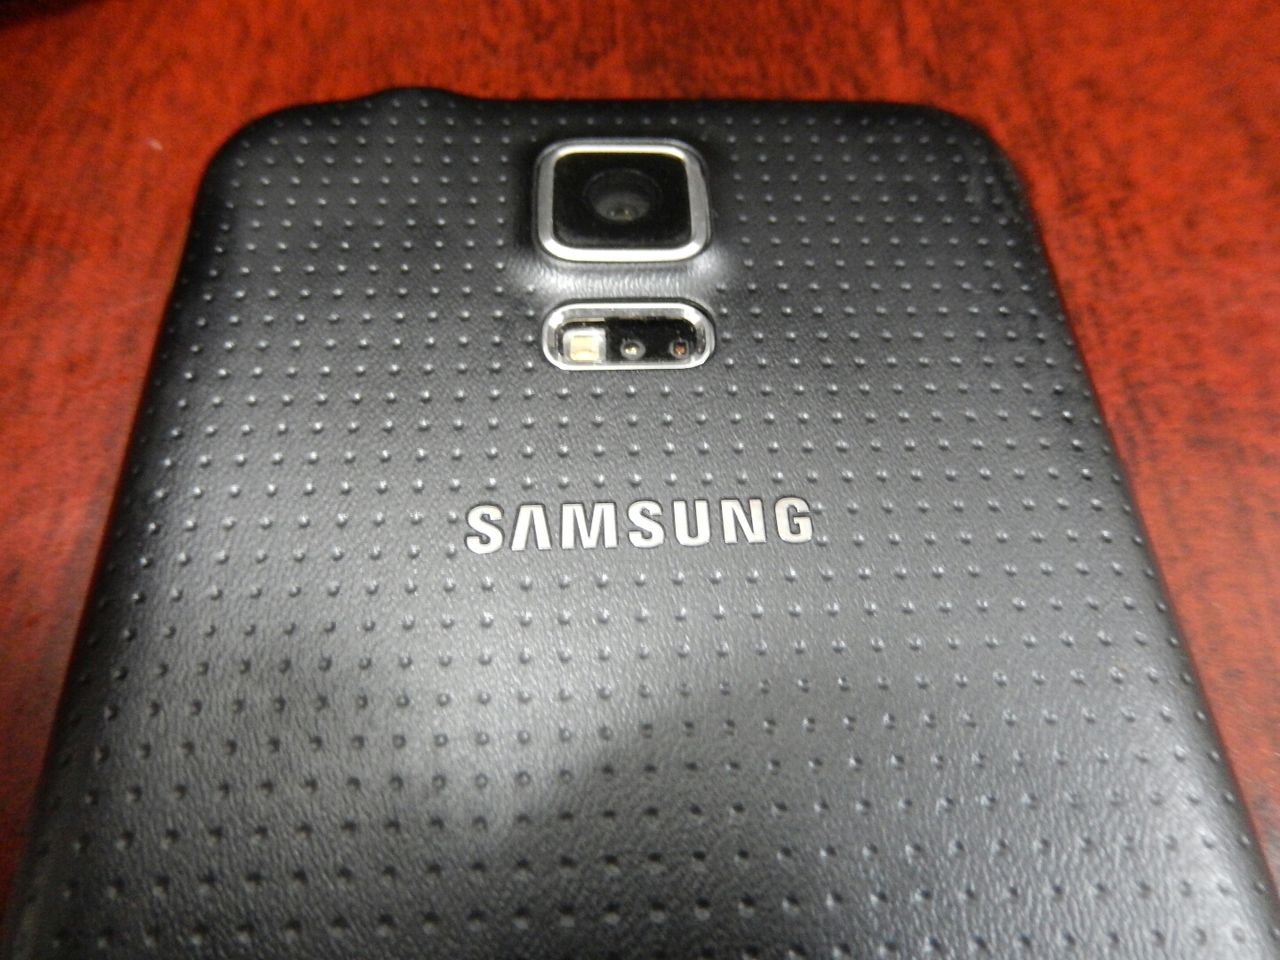 Inget utbytbart batteri i Galaxy S6?